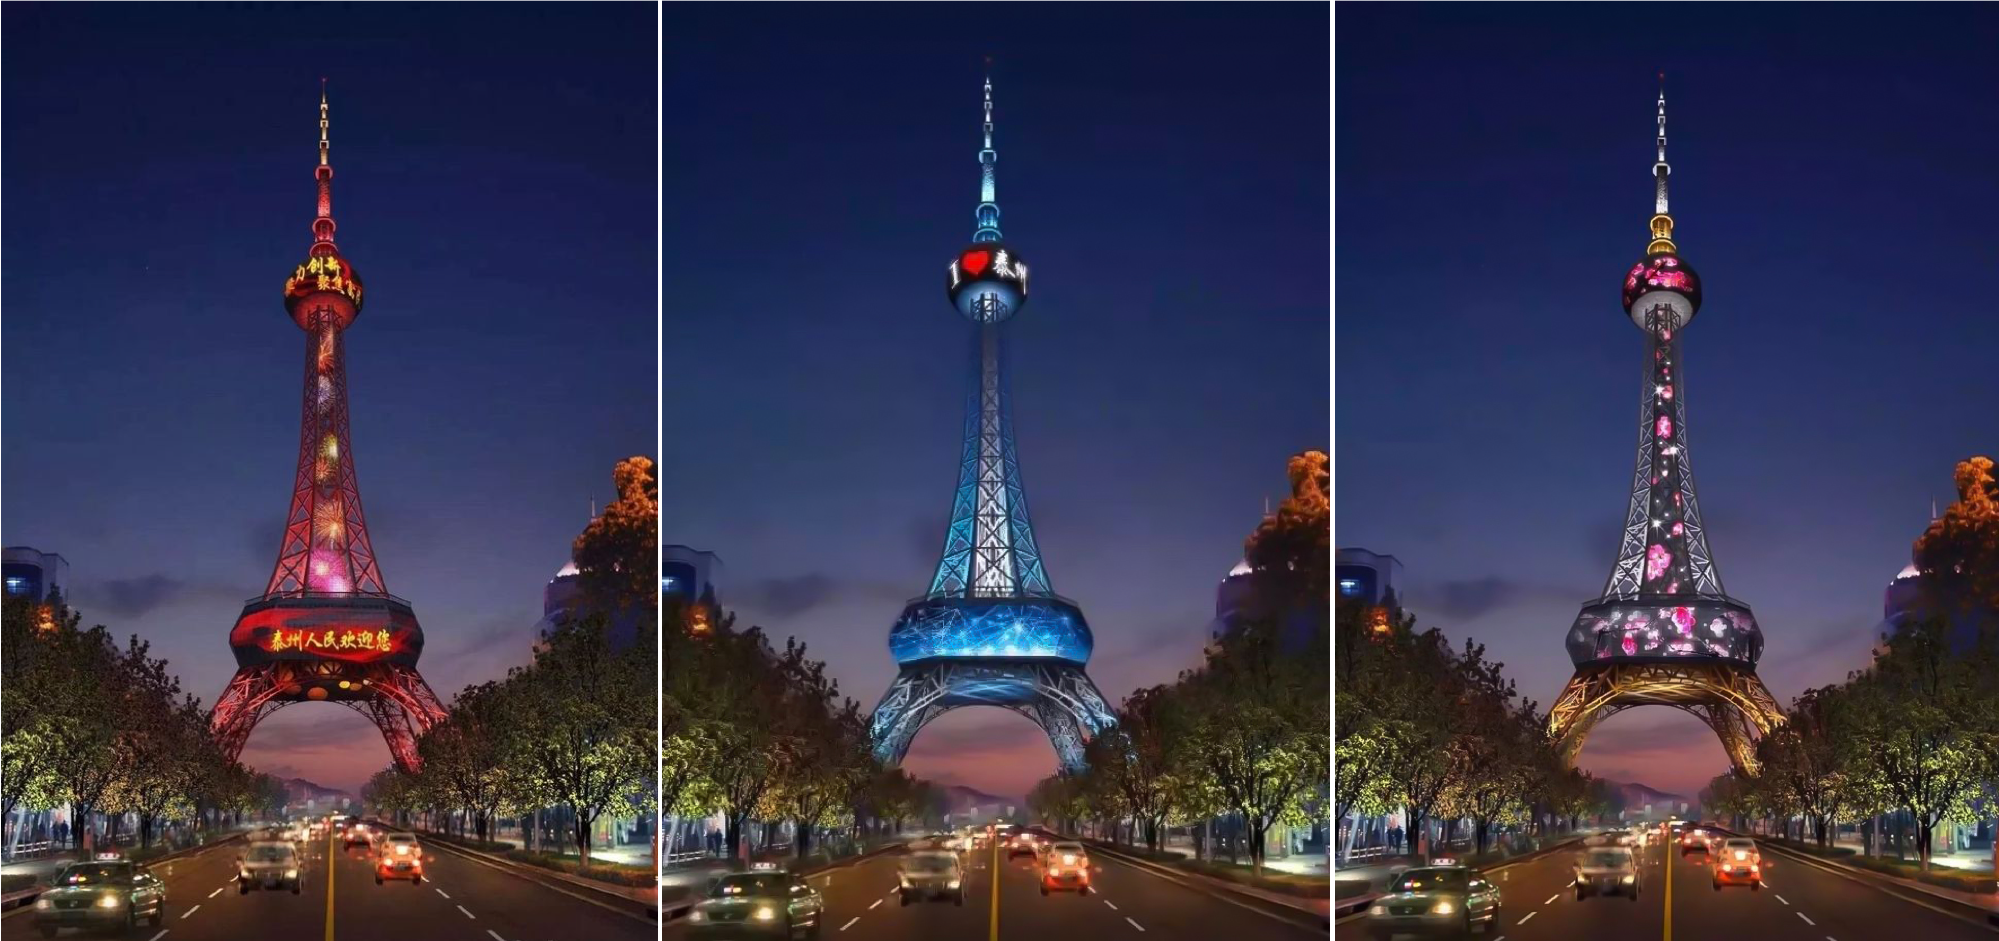 Taizhou TV Tower Project Zebra-P50 380㎡